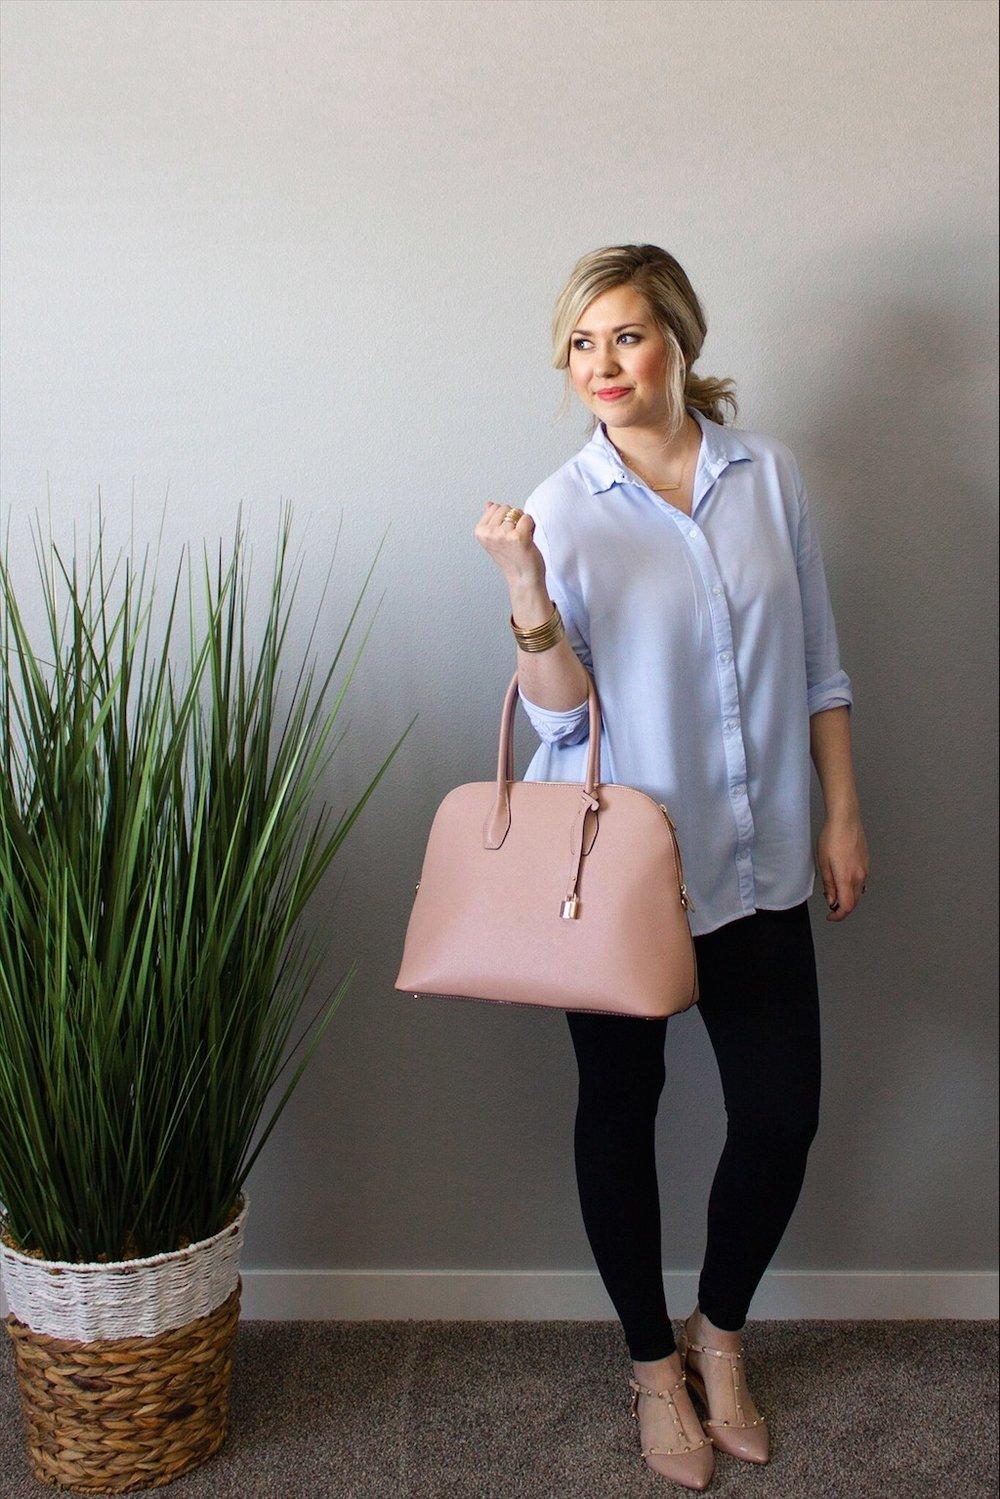 boyfriend-blouse-outfit-2.JPG